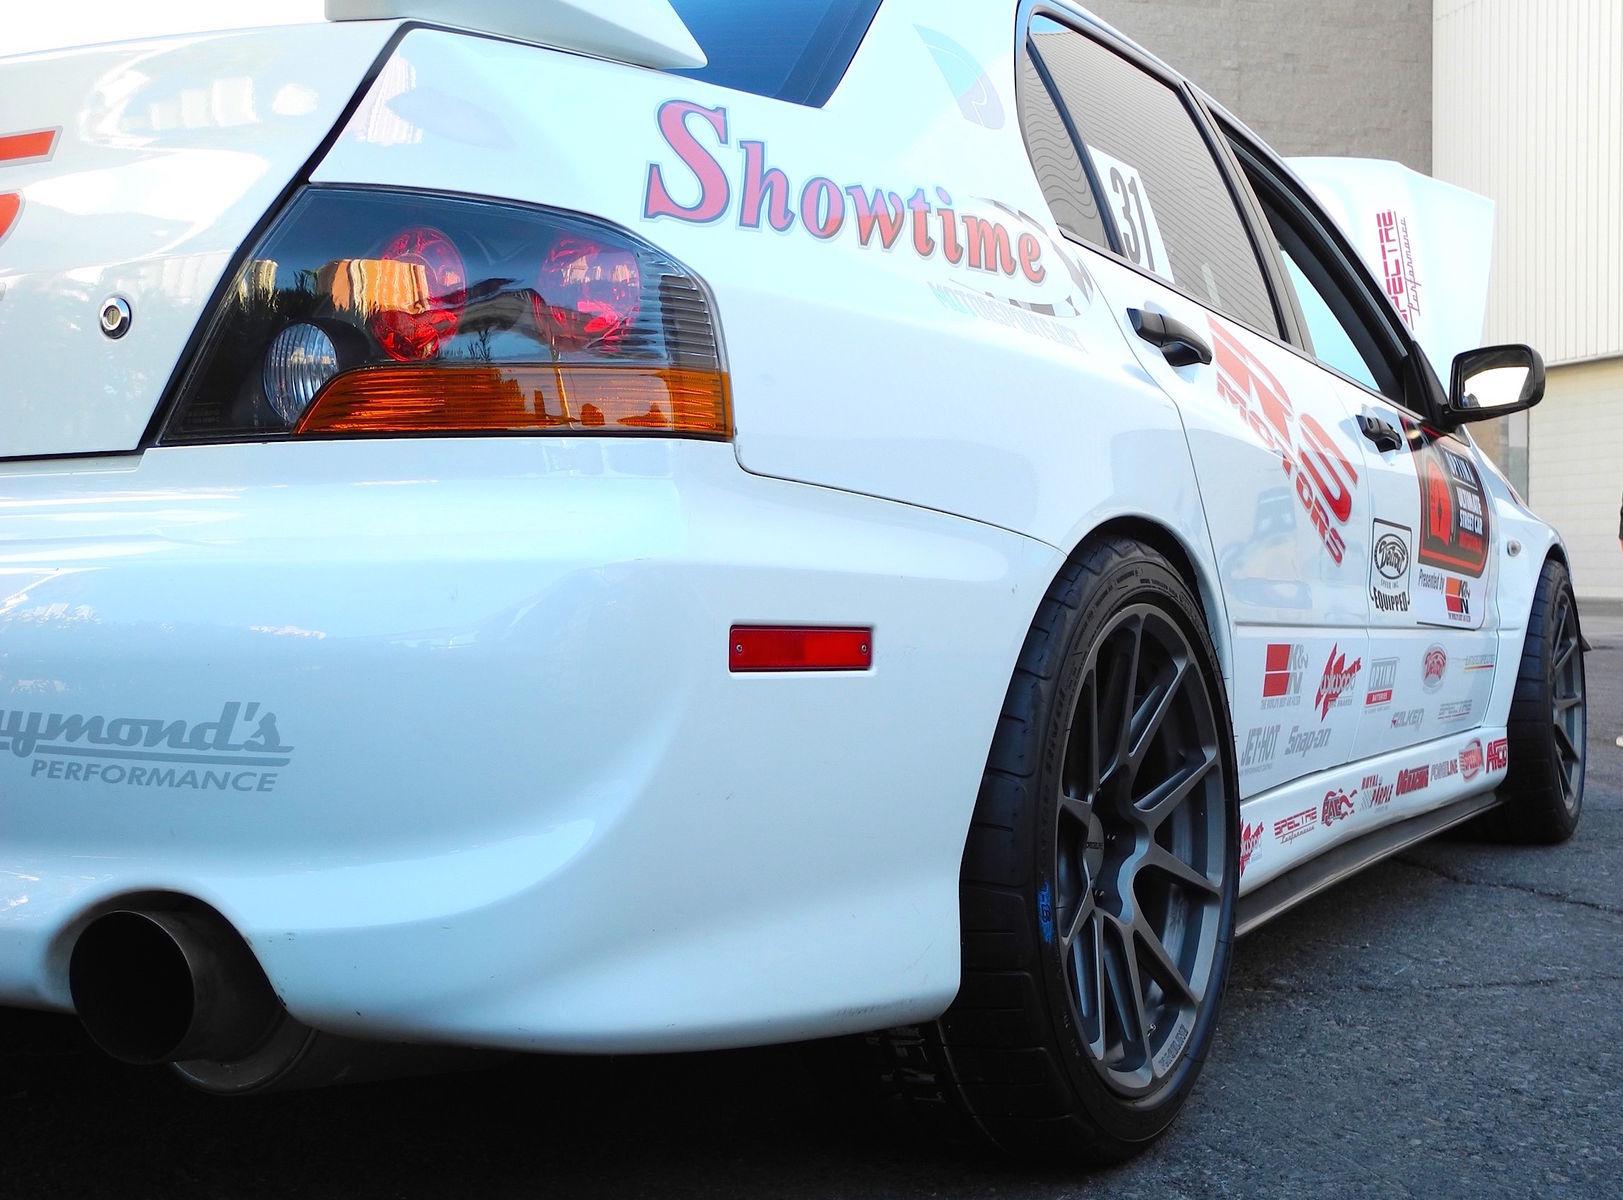 2006 Mitsubishi Lancer Evolution | Showtime Motorsports Evo on Forgeline GA1R Open Lug Wheels - Low Wheel View